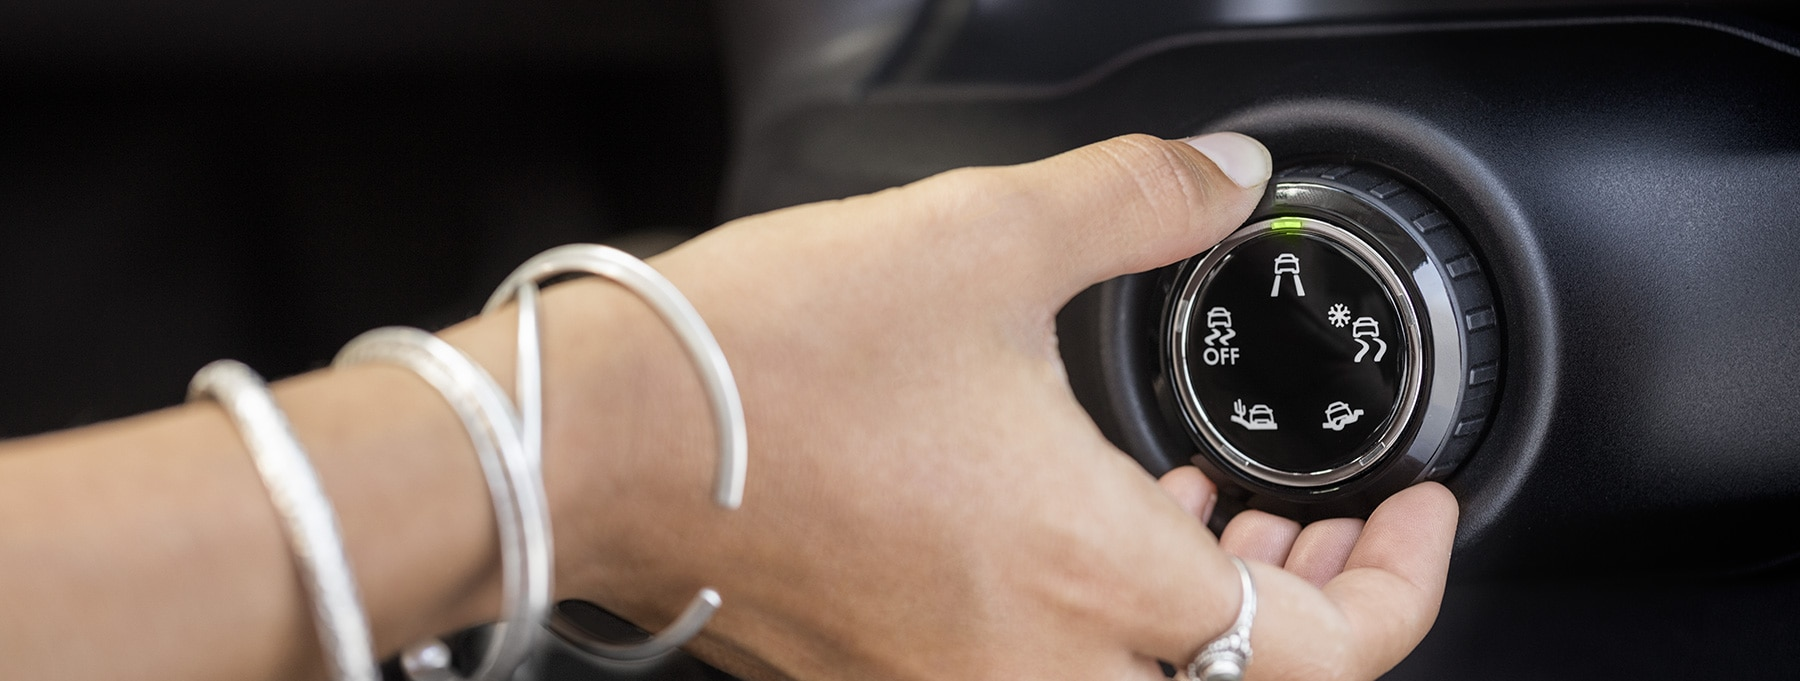 grip_control